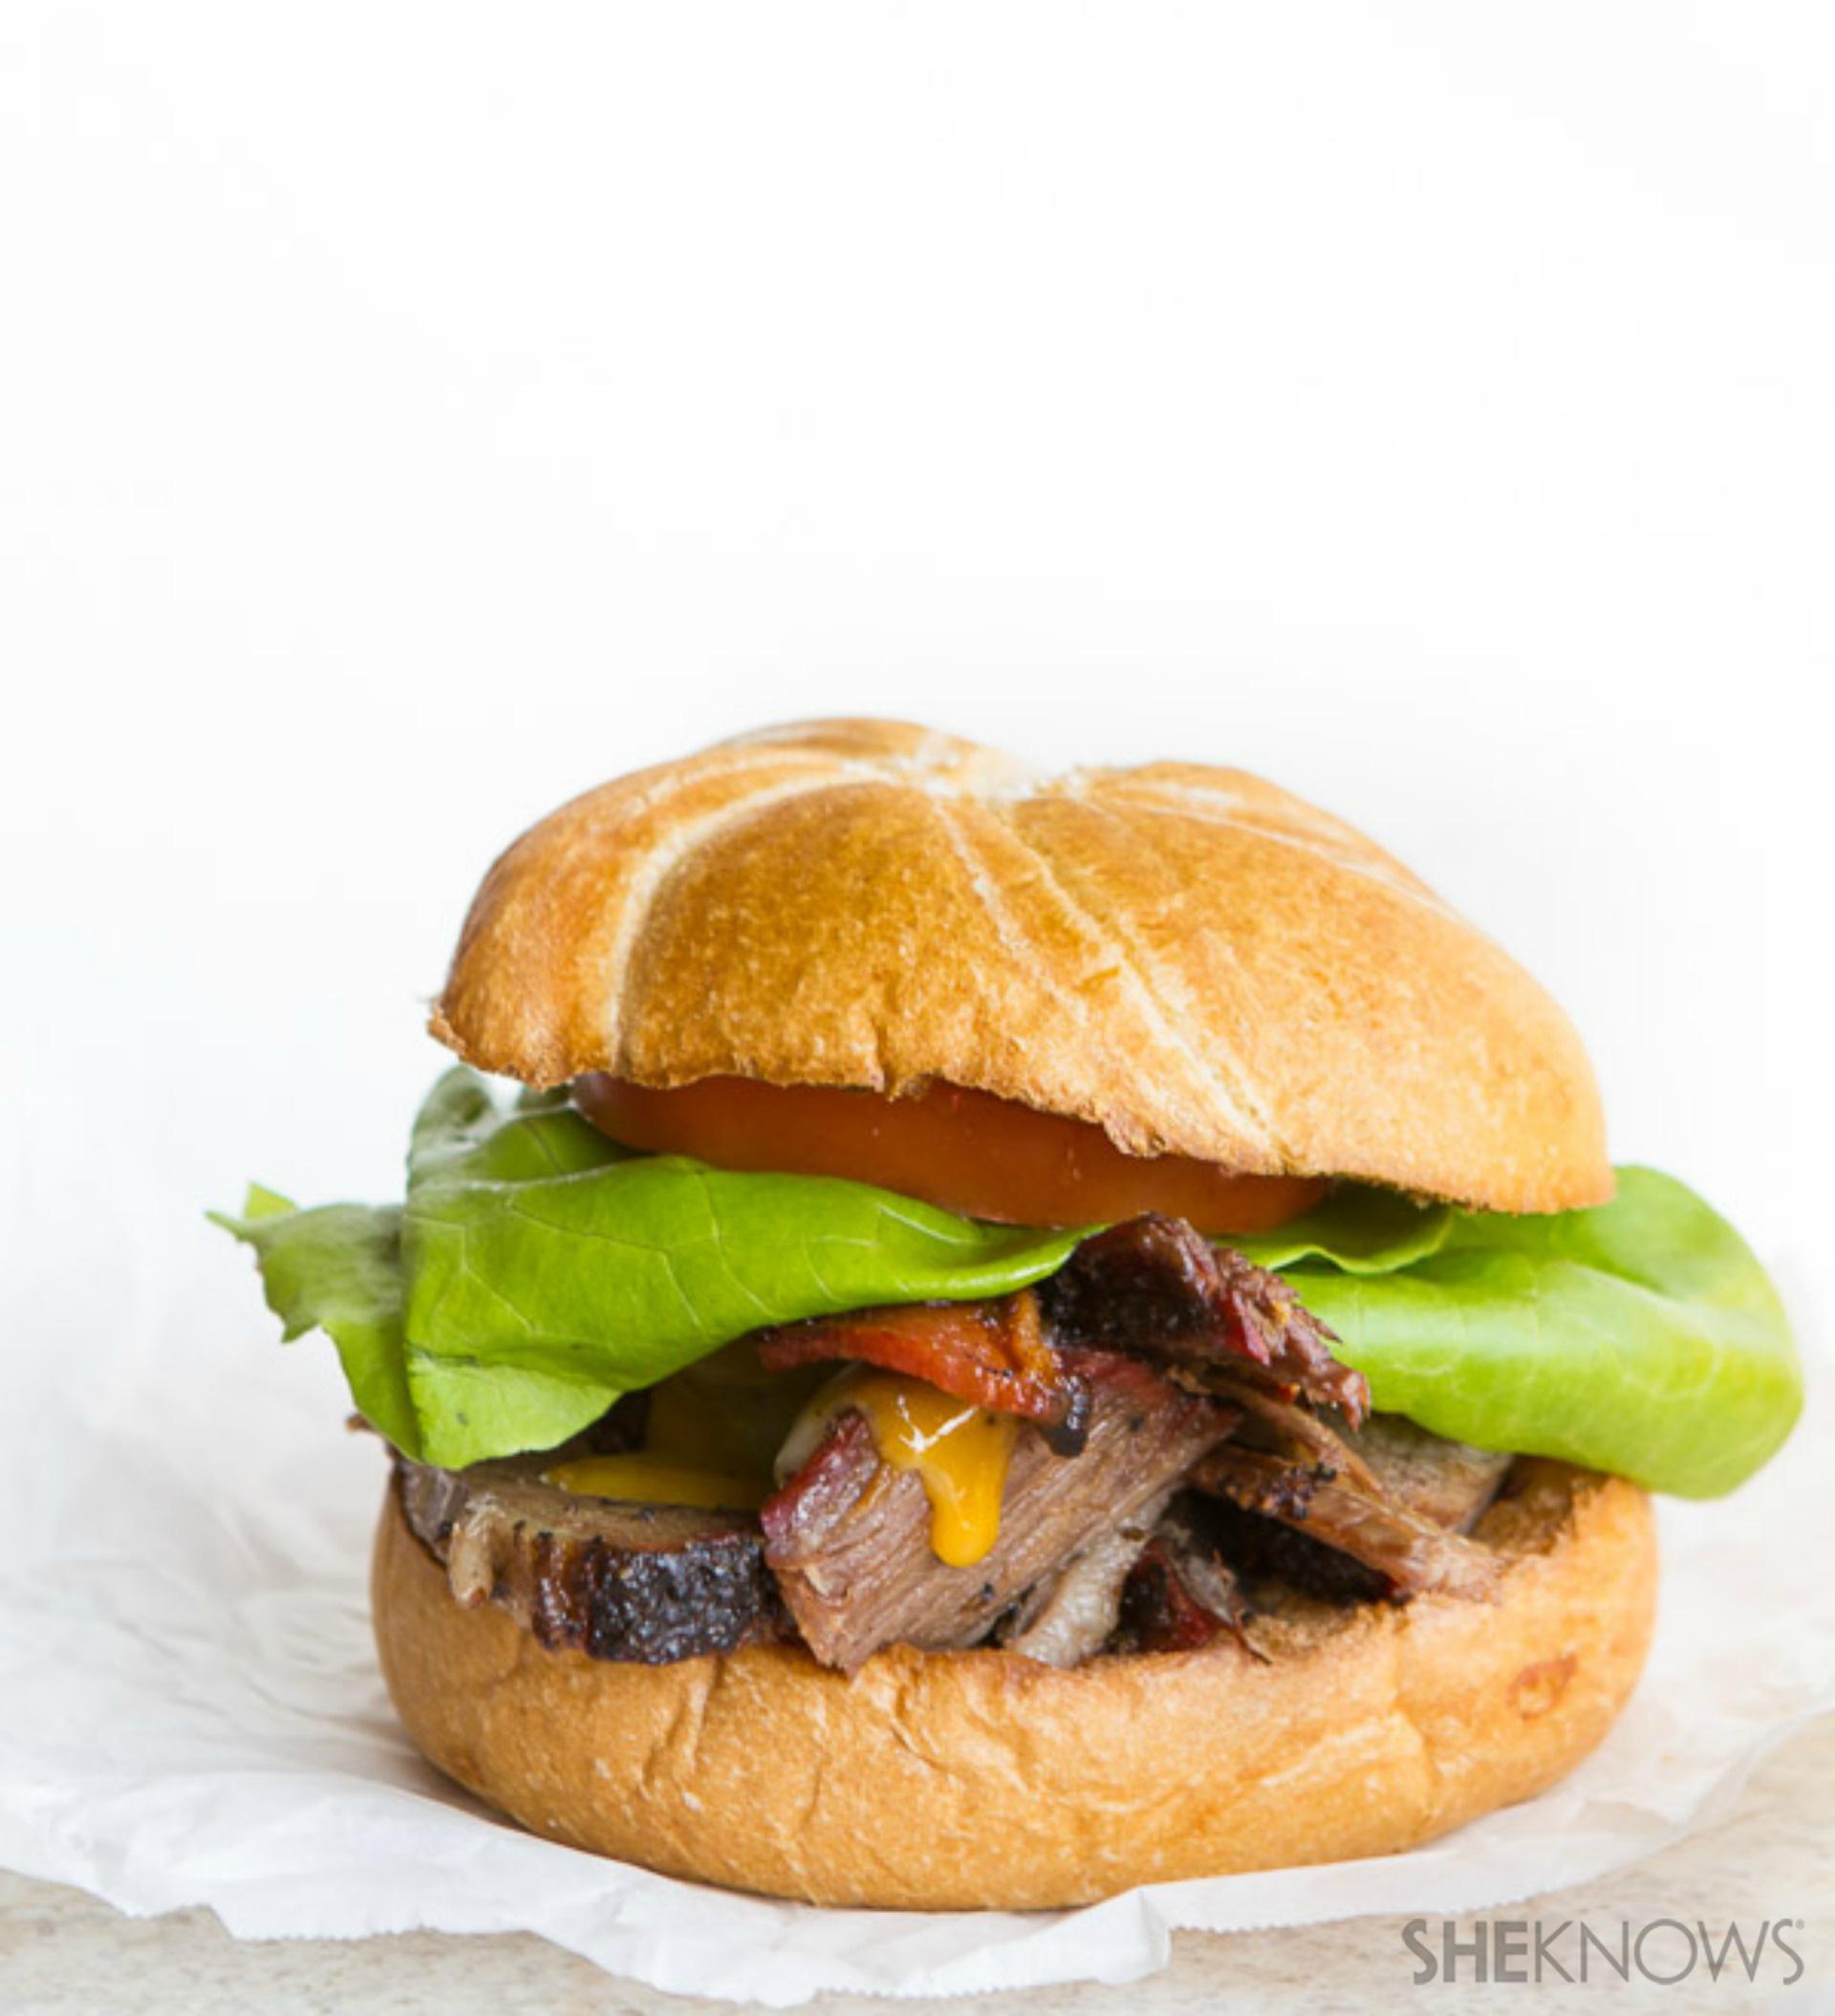 How do you make a BLT even better? Add tender, juicy brisket.